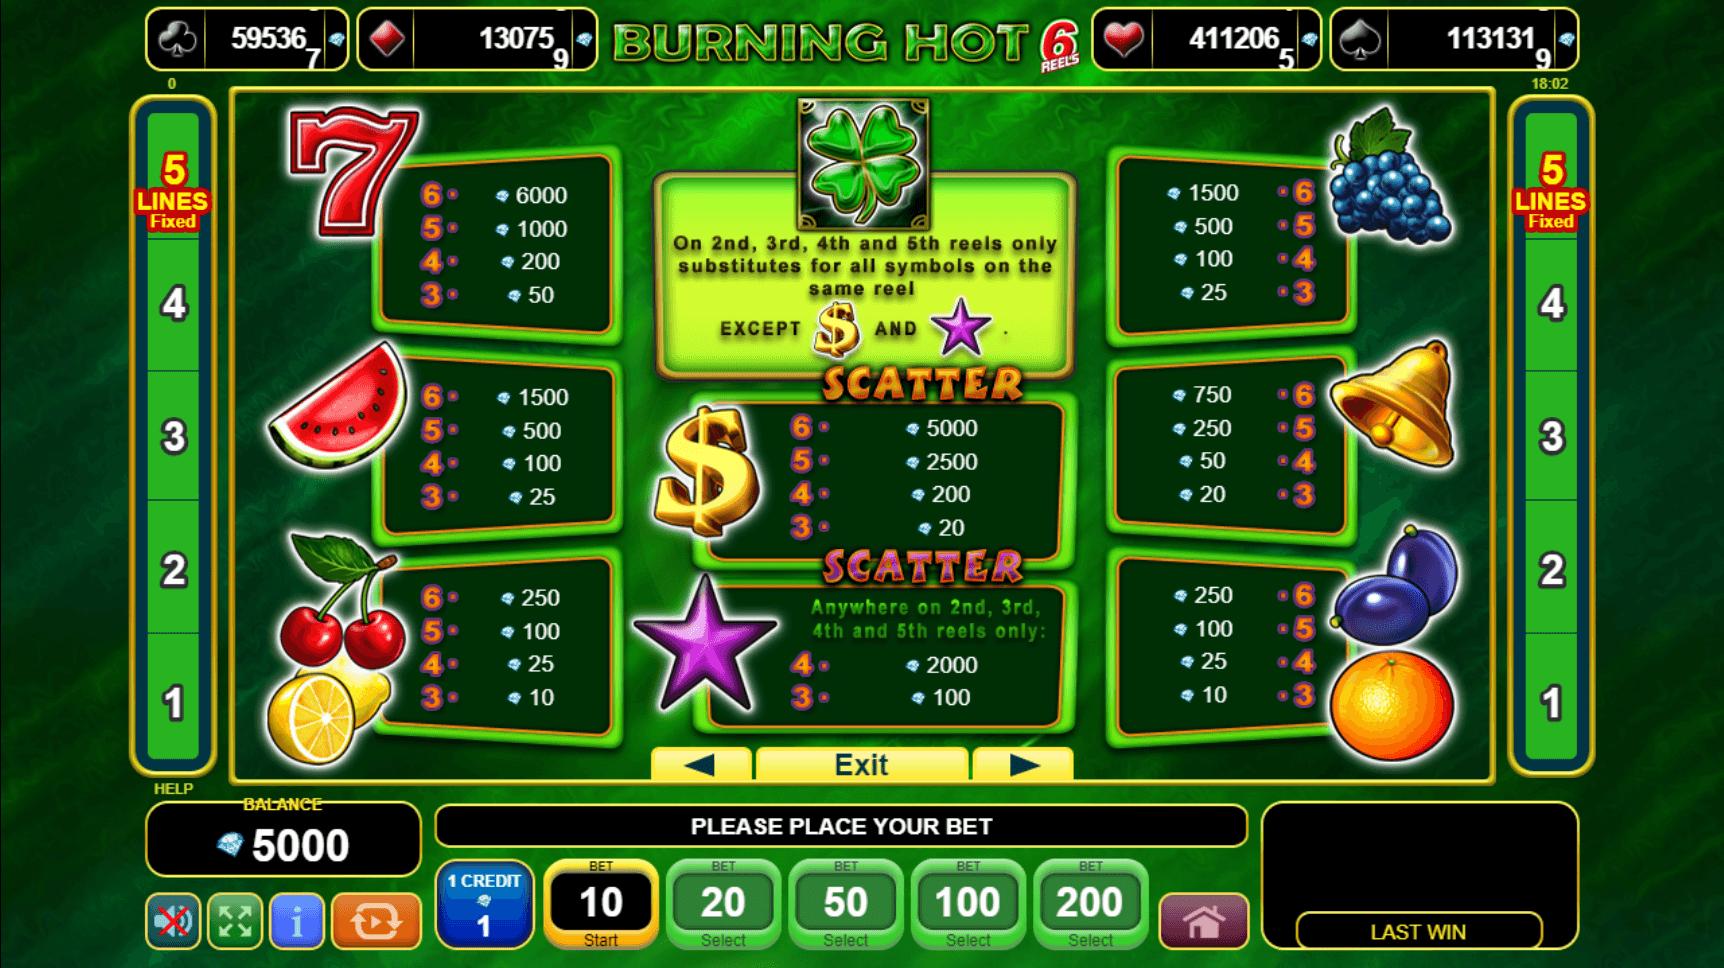 Burning Hot 6 Reels Slot Machine